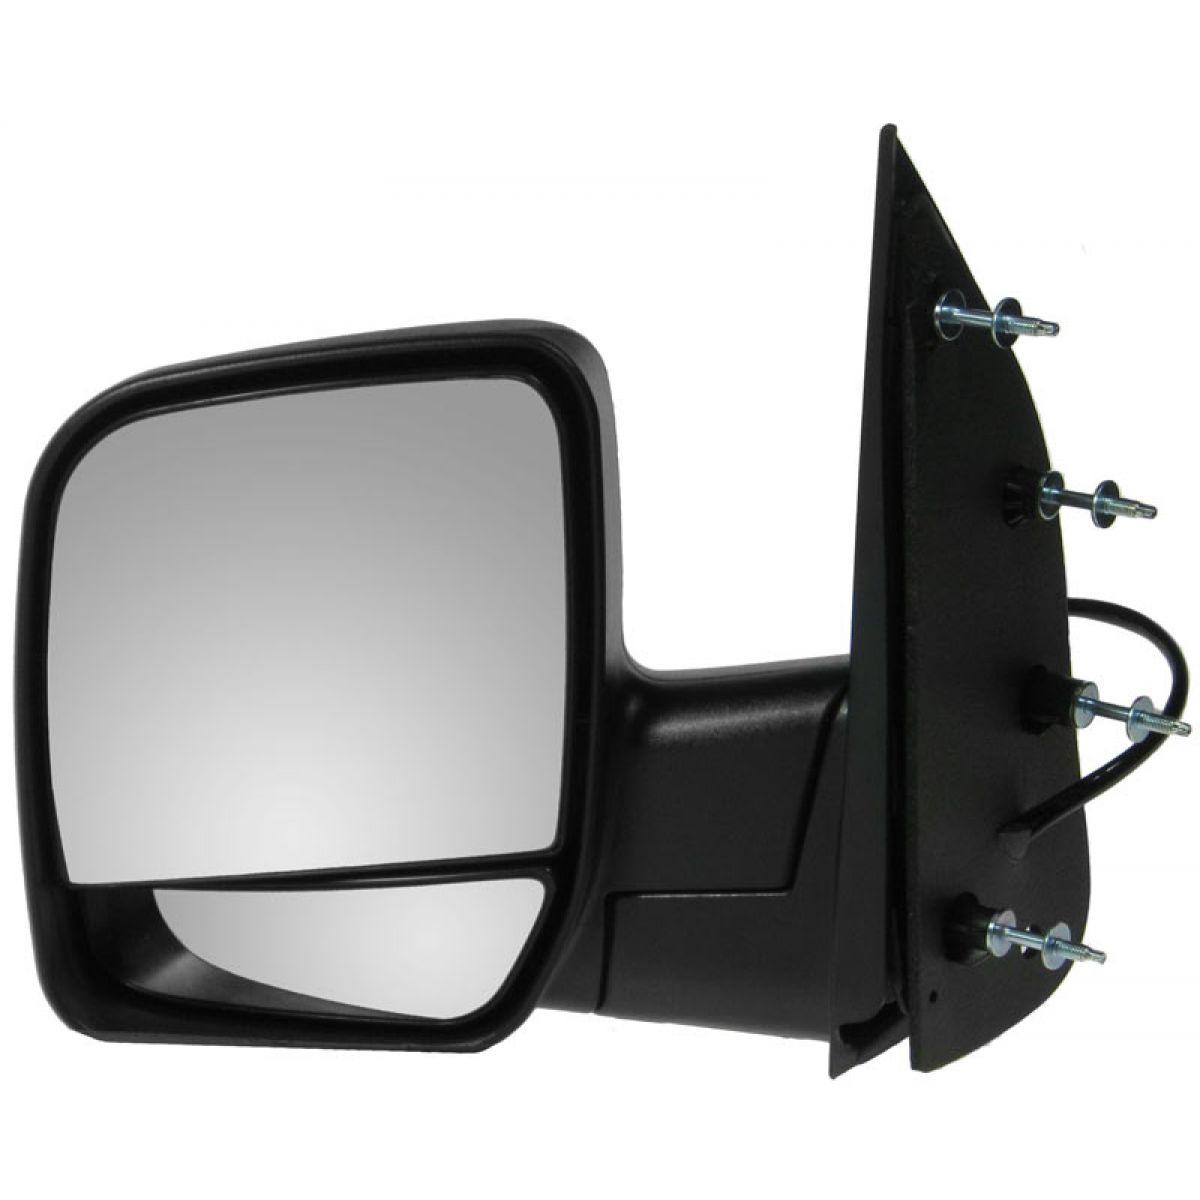 02-08 Econoline Van Manual Black Folding Rear View Mirror Left Driver Side NEW